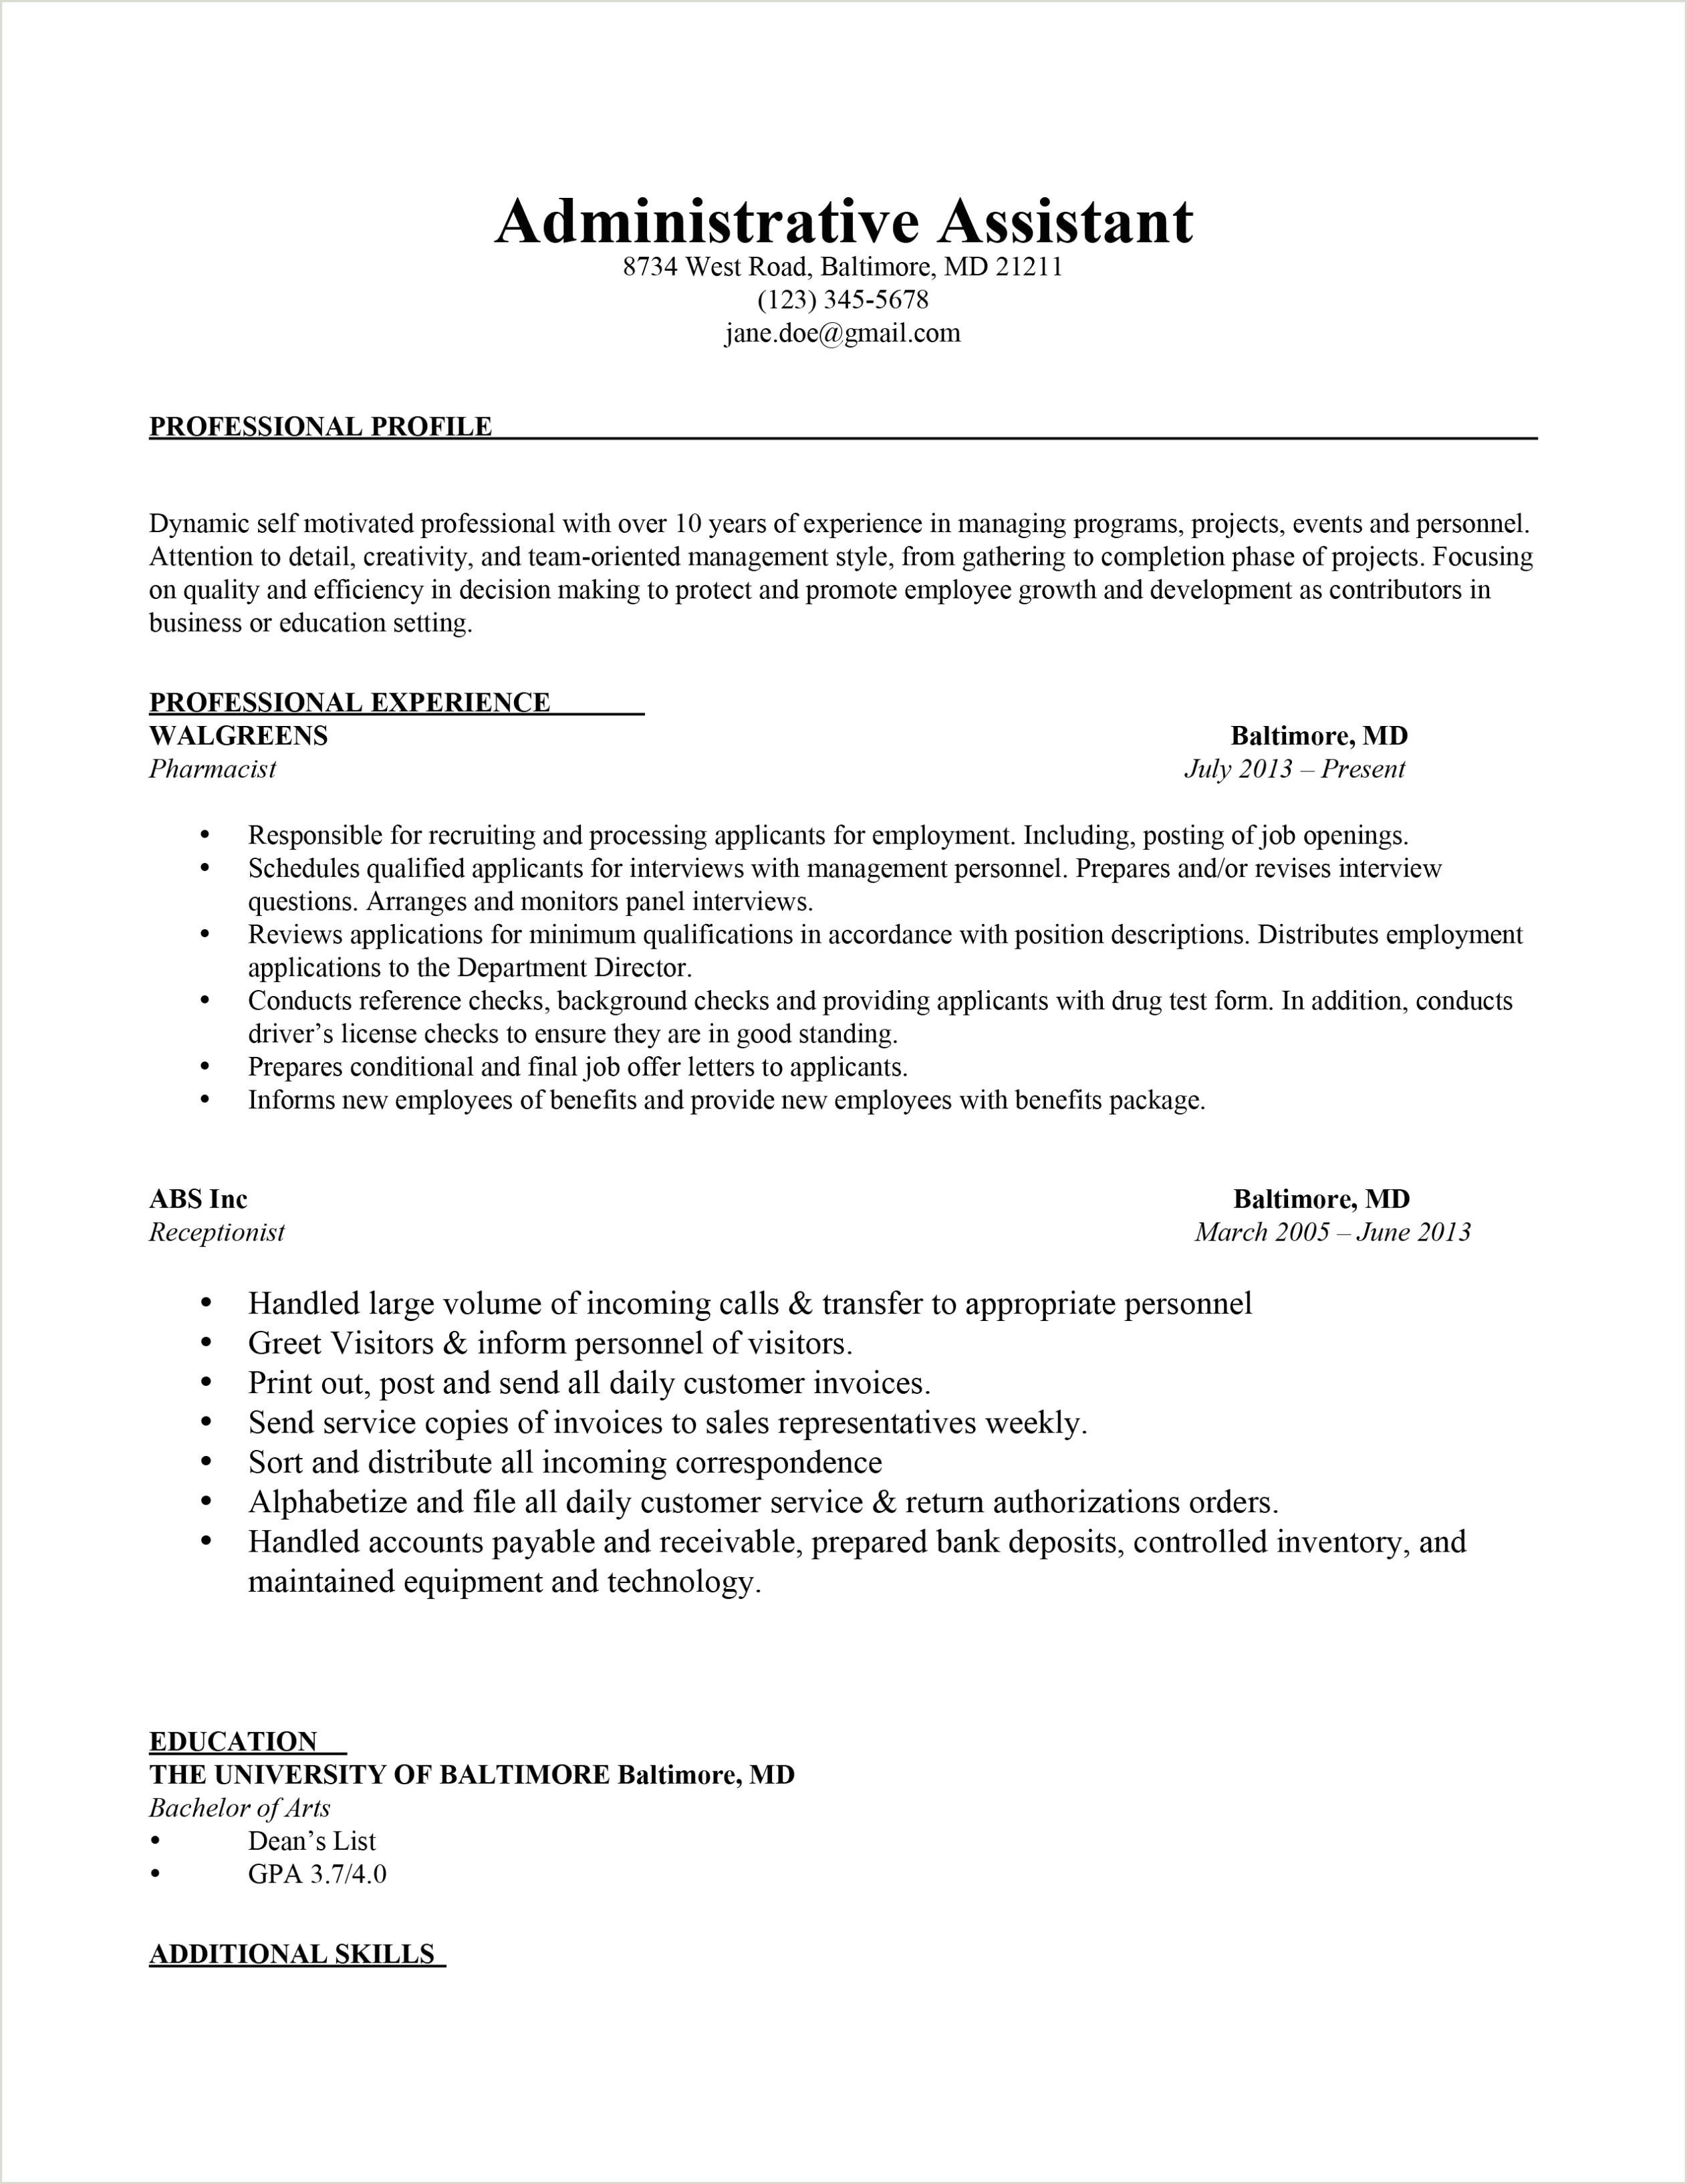 10 Business Acumen Resume Examples